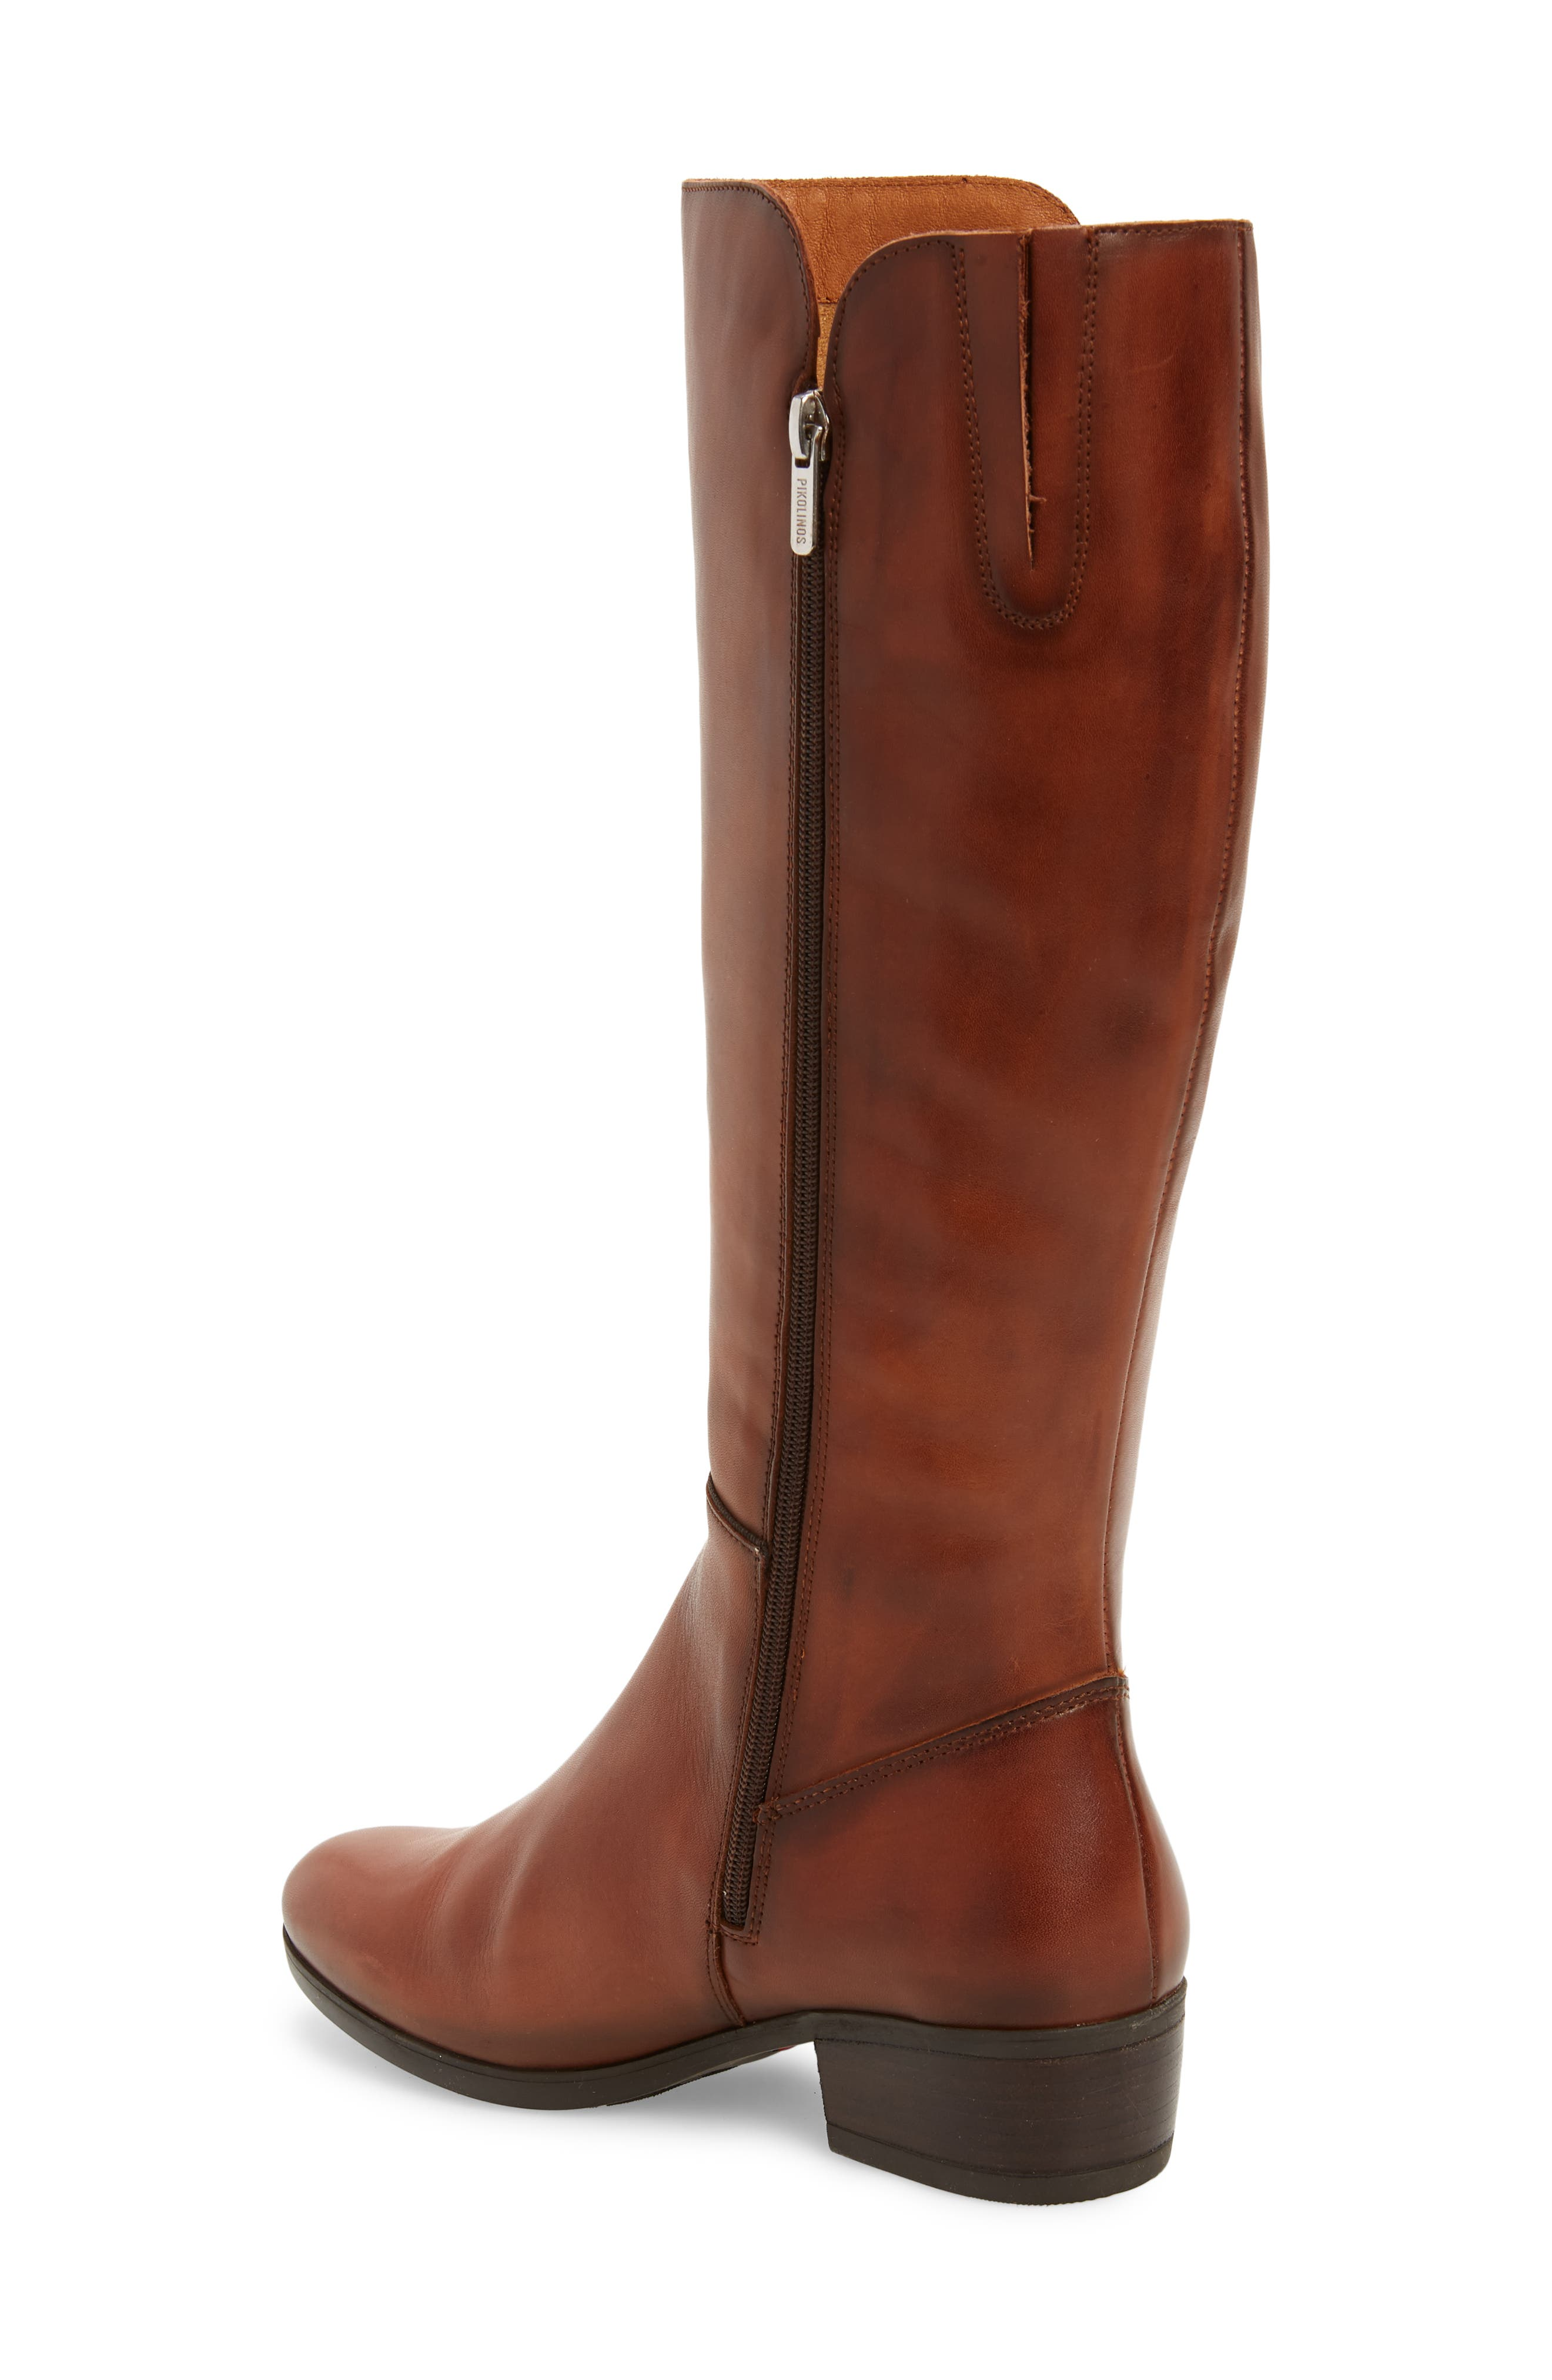 b4da6fc7679 Women's PIKOLINOS Boots | Nordstrom